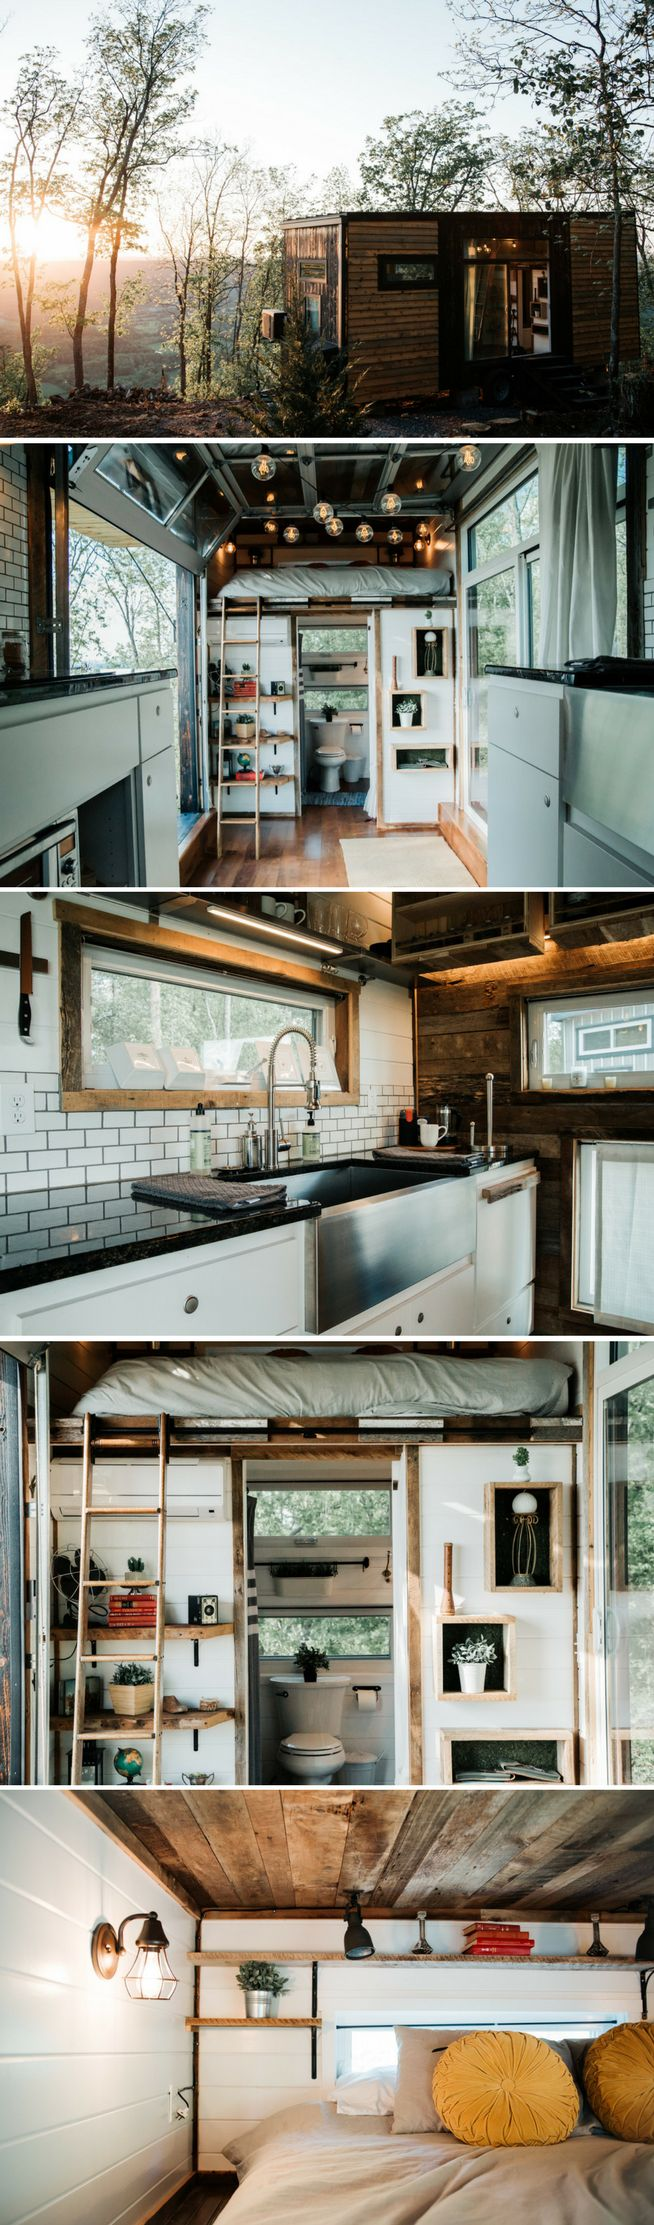 Best 25 Tiny House Interiors Ideas On Pinterest Small